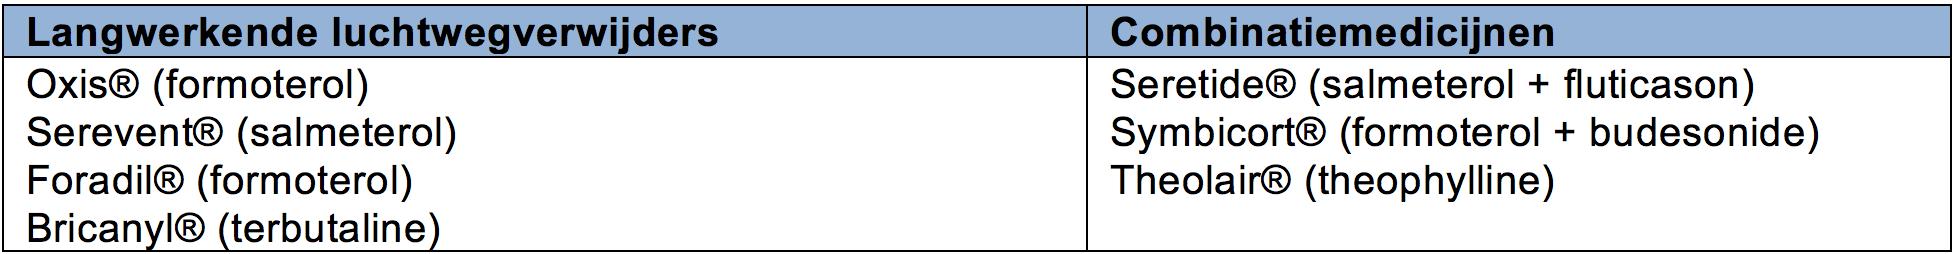 tabel-003